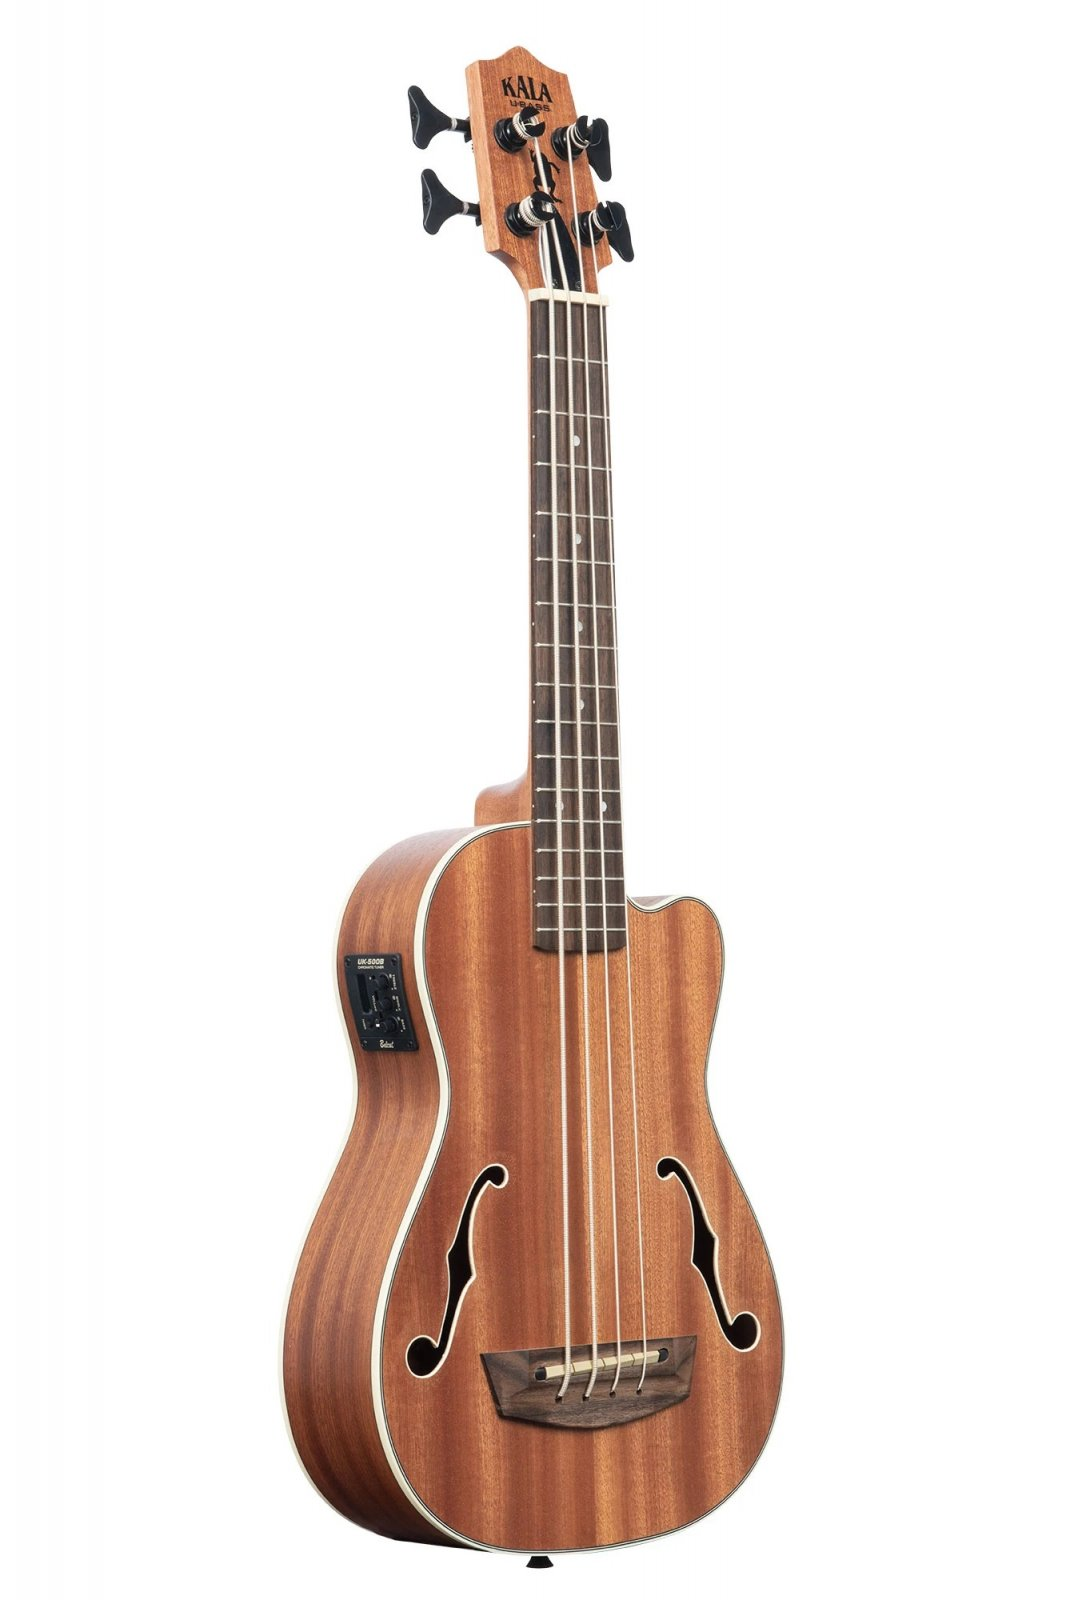 Kala UBASS-JYMN-FS Journeyman Acoustic-Electric U-Bass with F-Holes